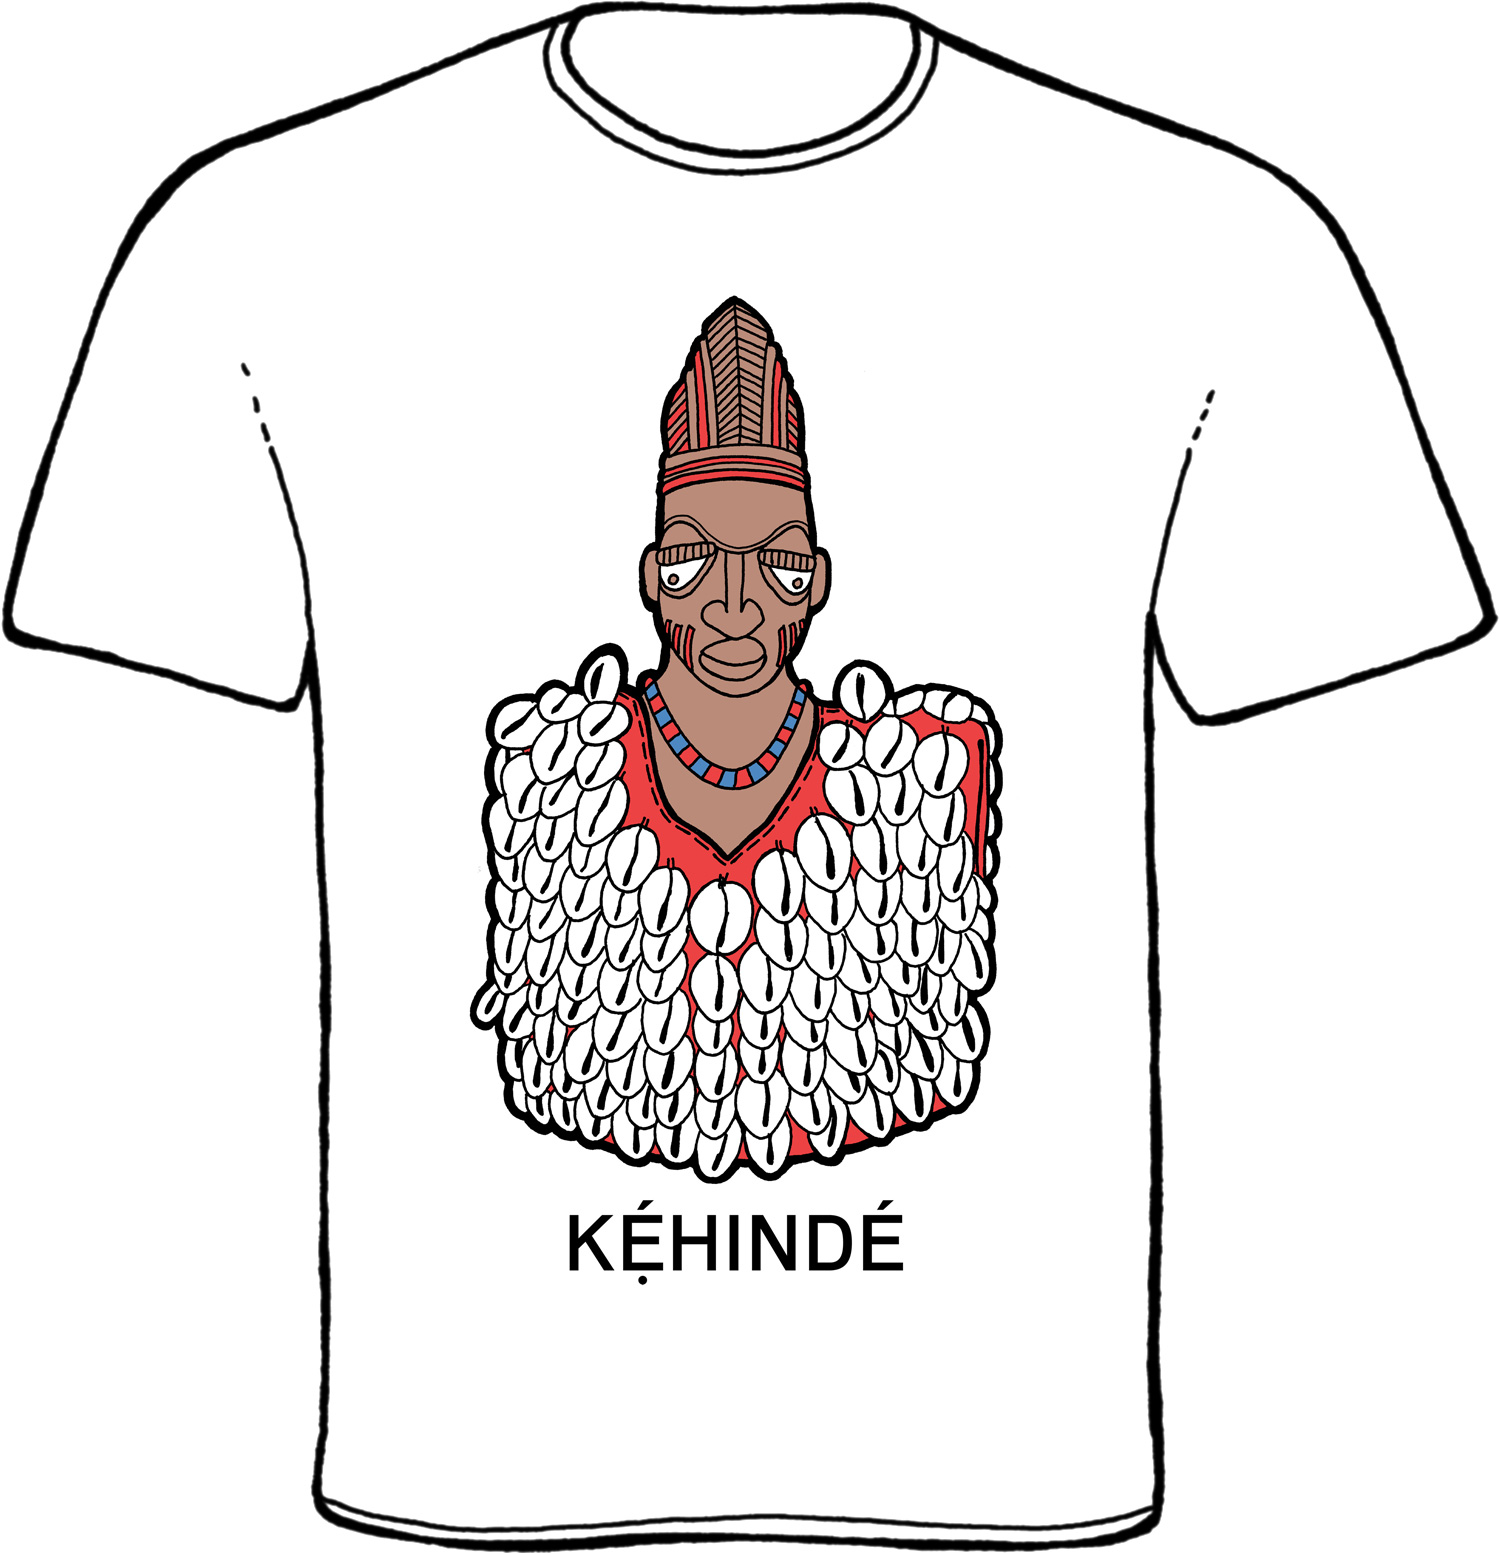 kehinde, ibeji, taiwo, yoruba, twins, twin, jimaguas, beyi, santeria, orisha, oricha, orixa, cosmos damiao, cowry, wande abimbola, babalawo, ifa, orunmila, shango, oya, babalu aye